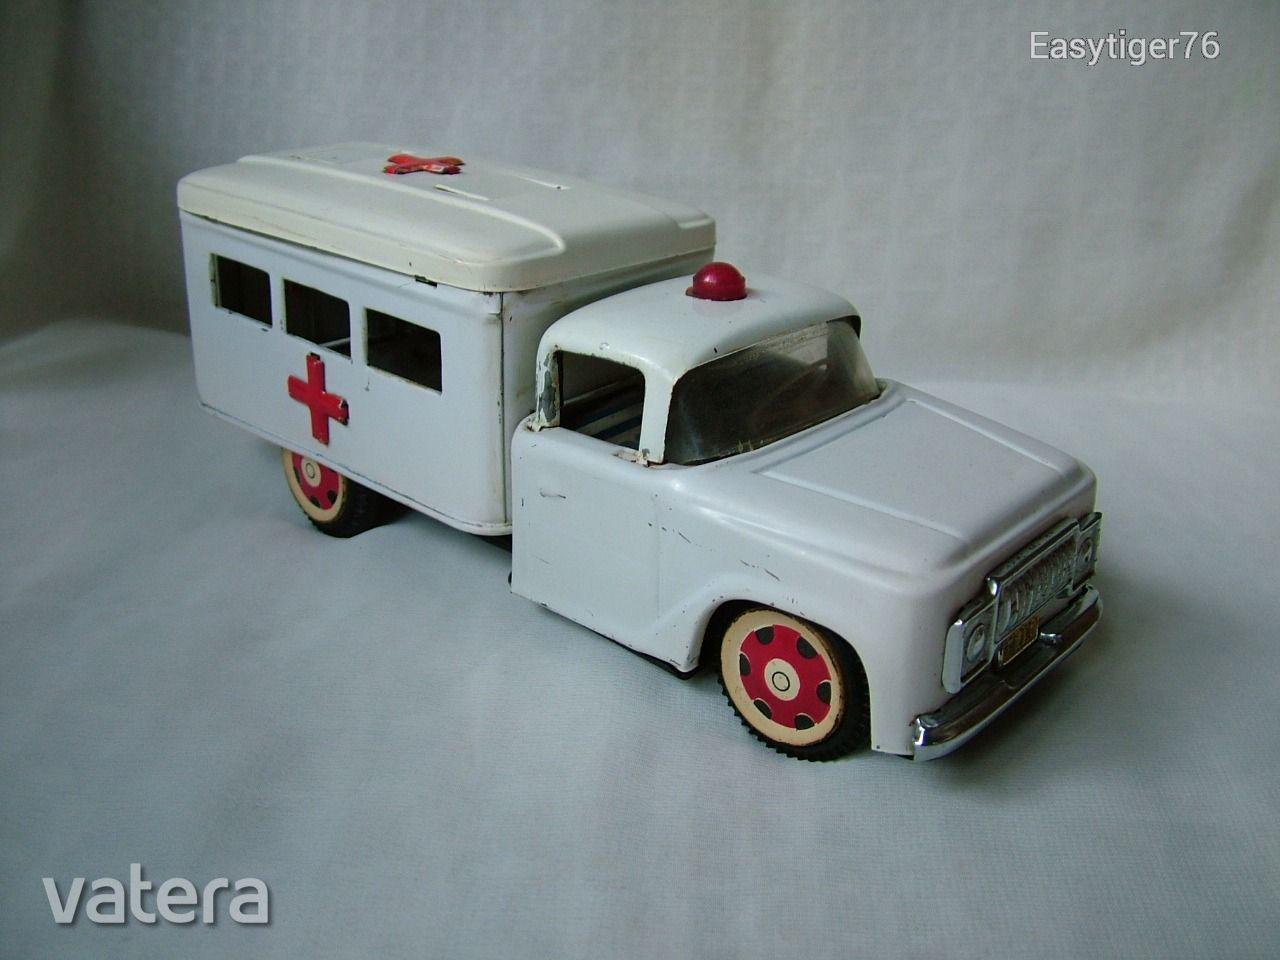 regi-lemezjatek-mentoauto-kinai-retro-lemezauto-ritka-darab-12ea_1_big.jpg